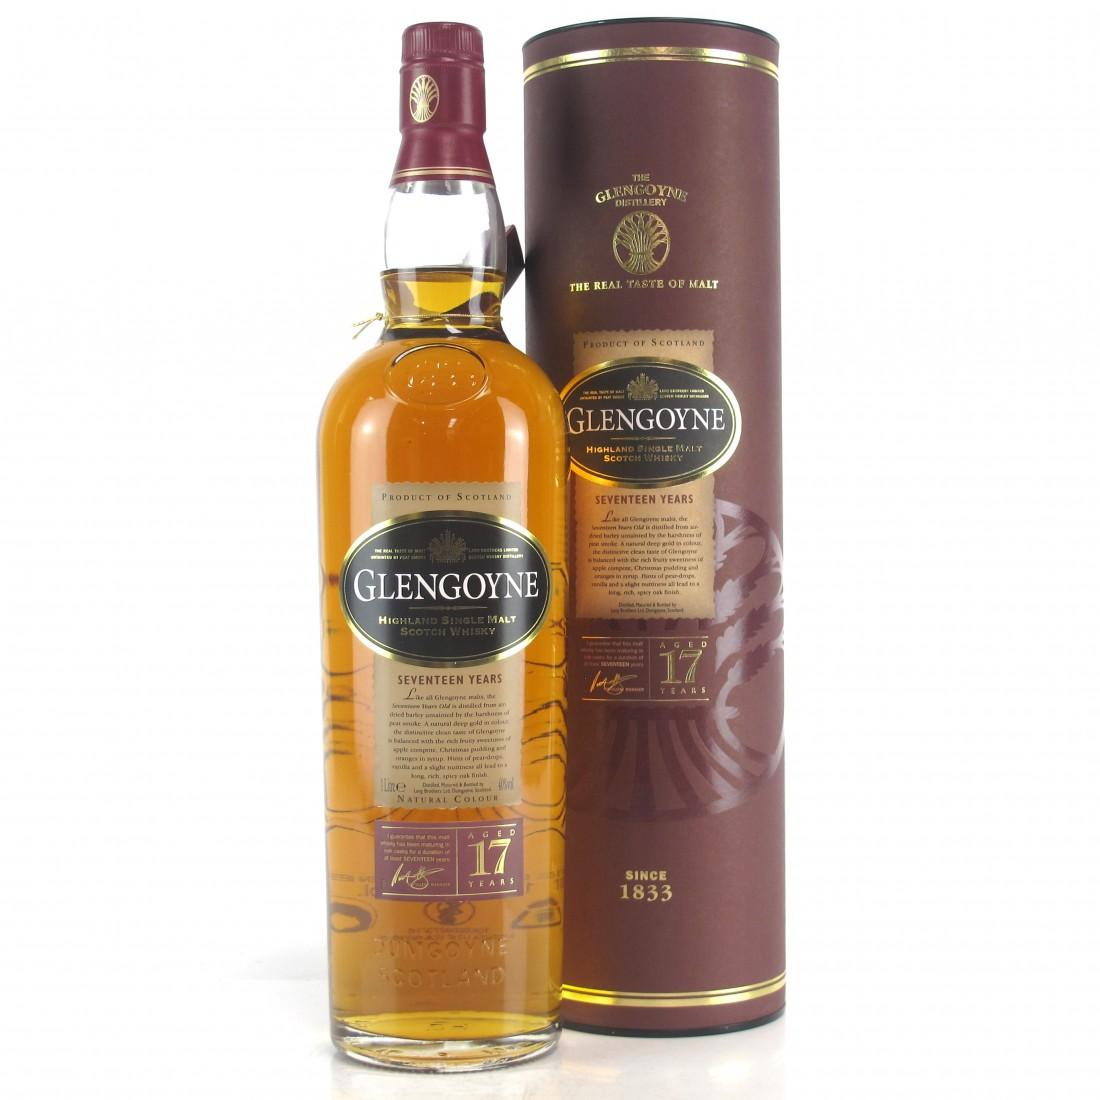 Glengoyne 17 Year Old 1 Litre